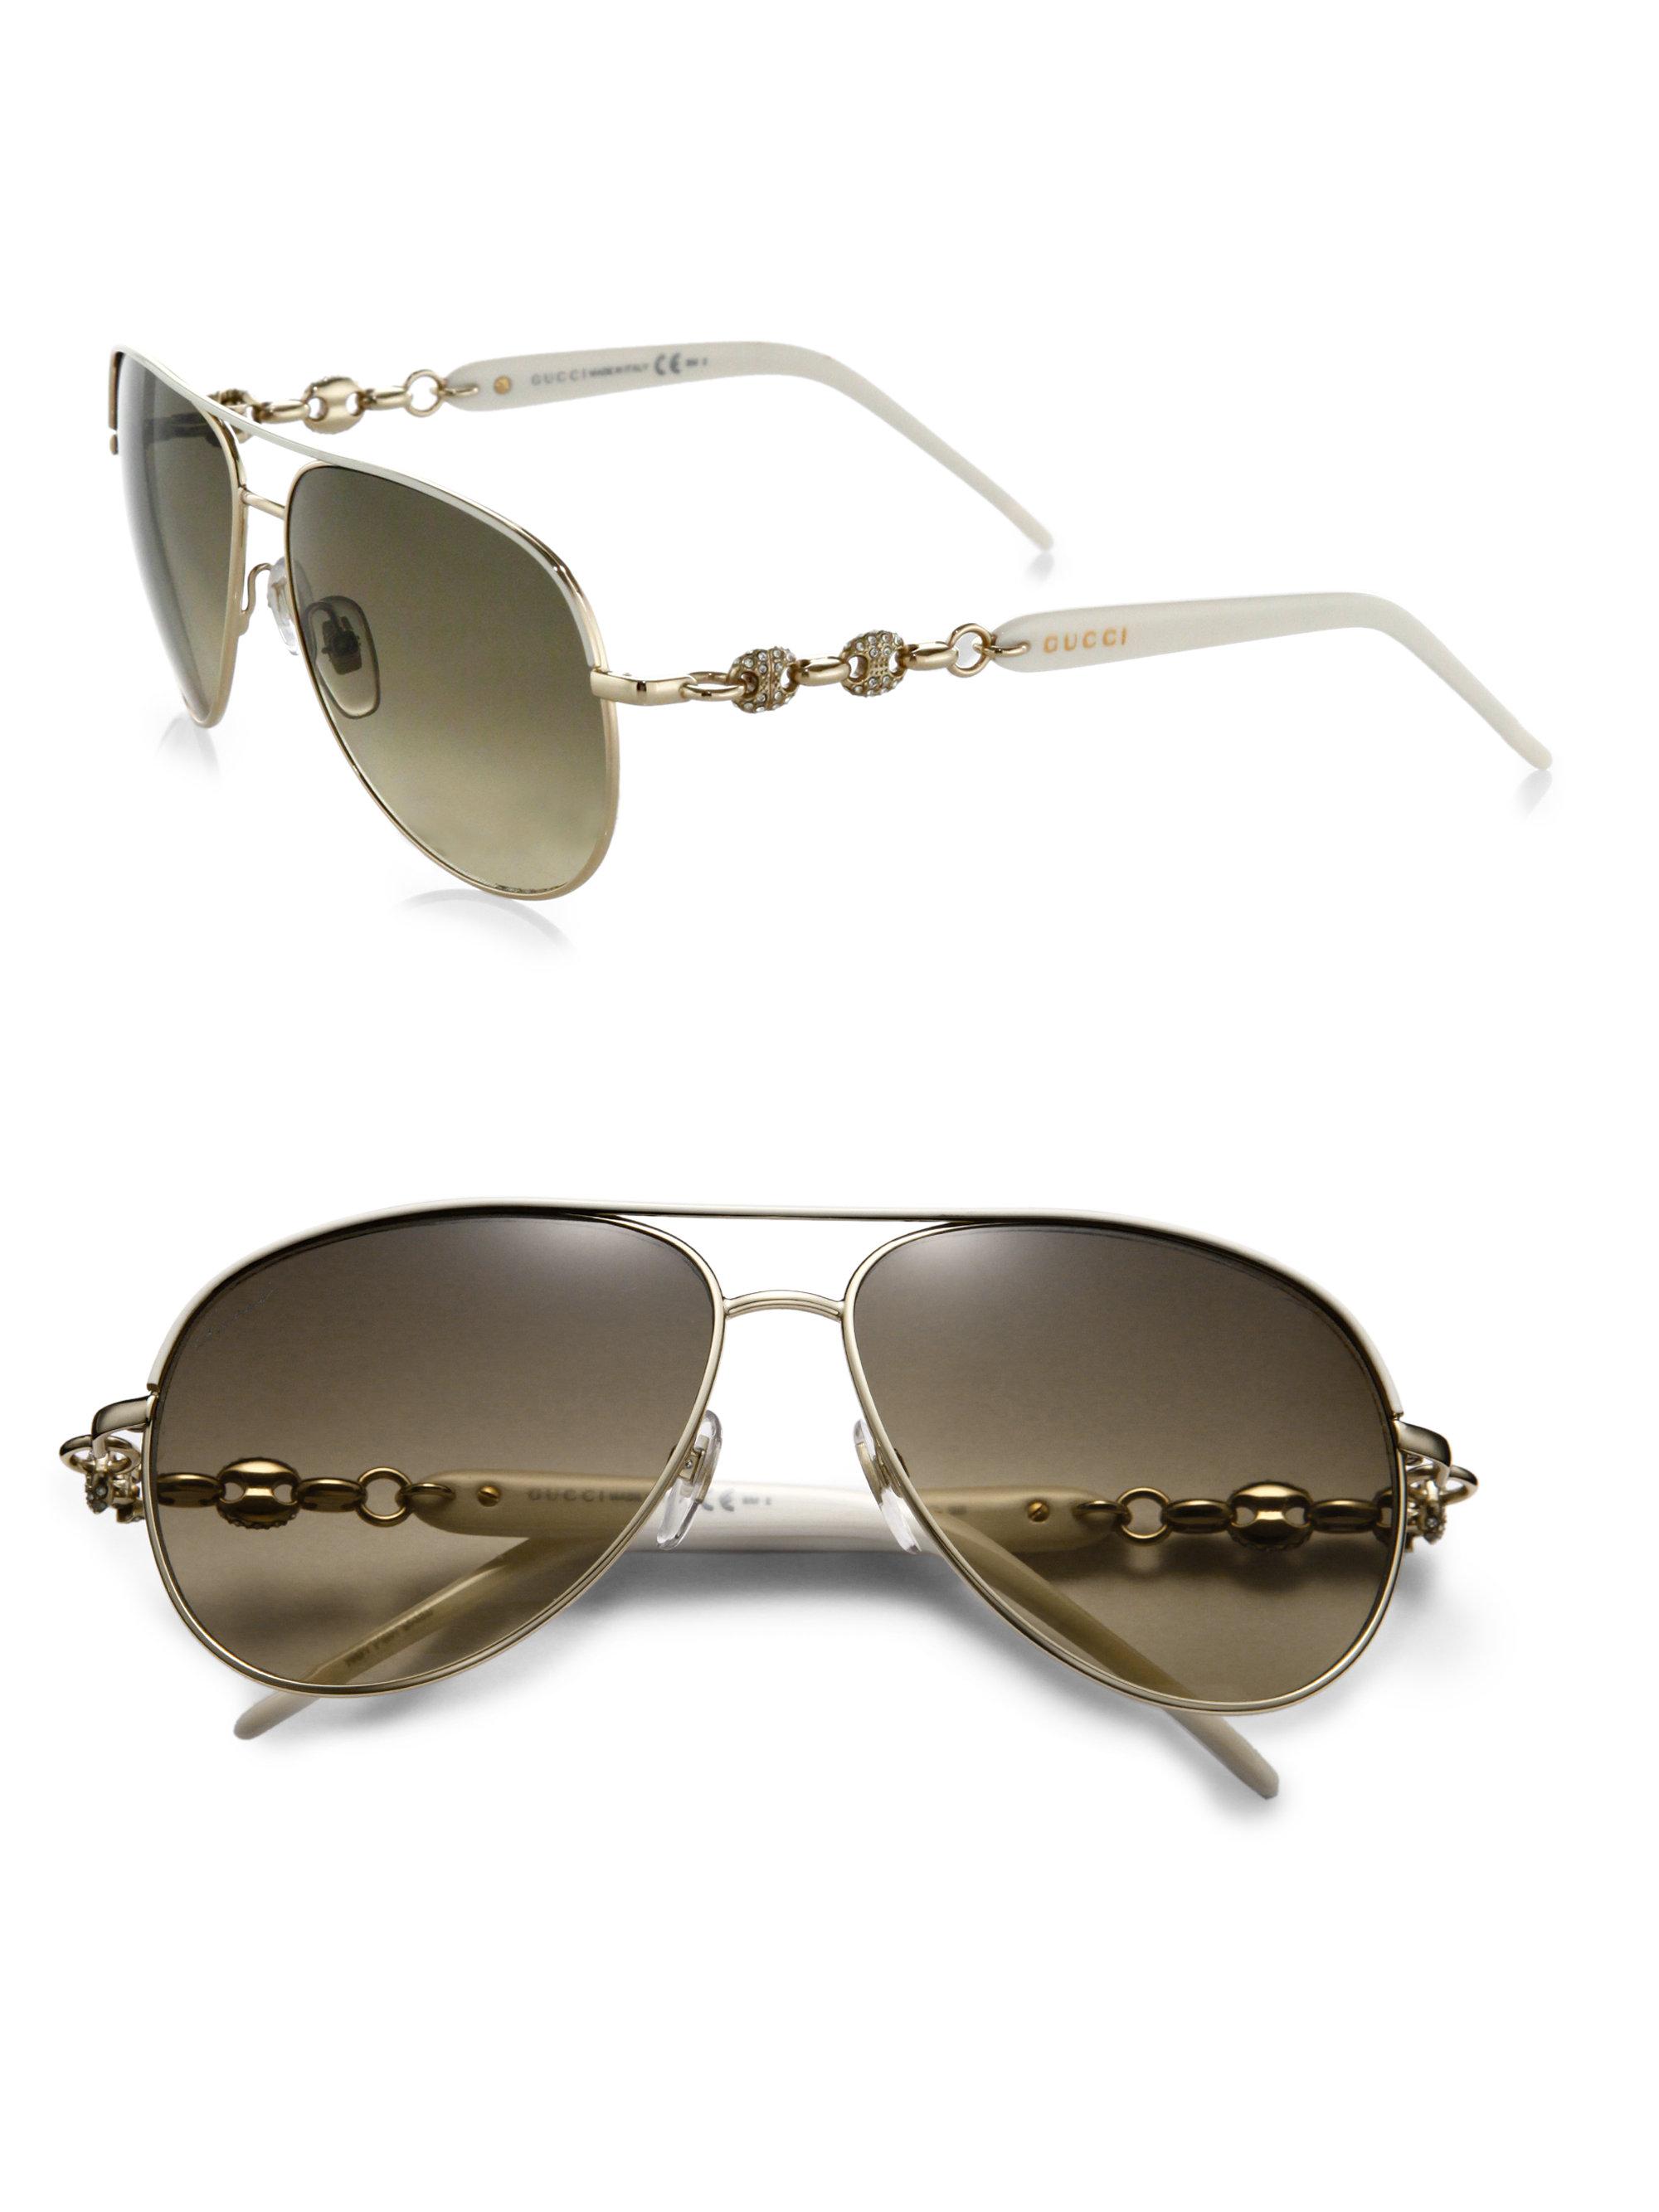 254cf287560 Lyst - Gucci Marina Chain 58mm Aviator Sunglasses in White for Men